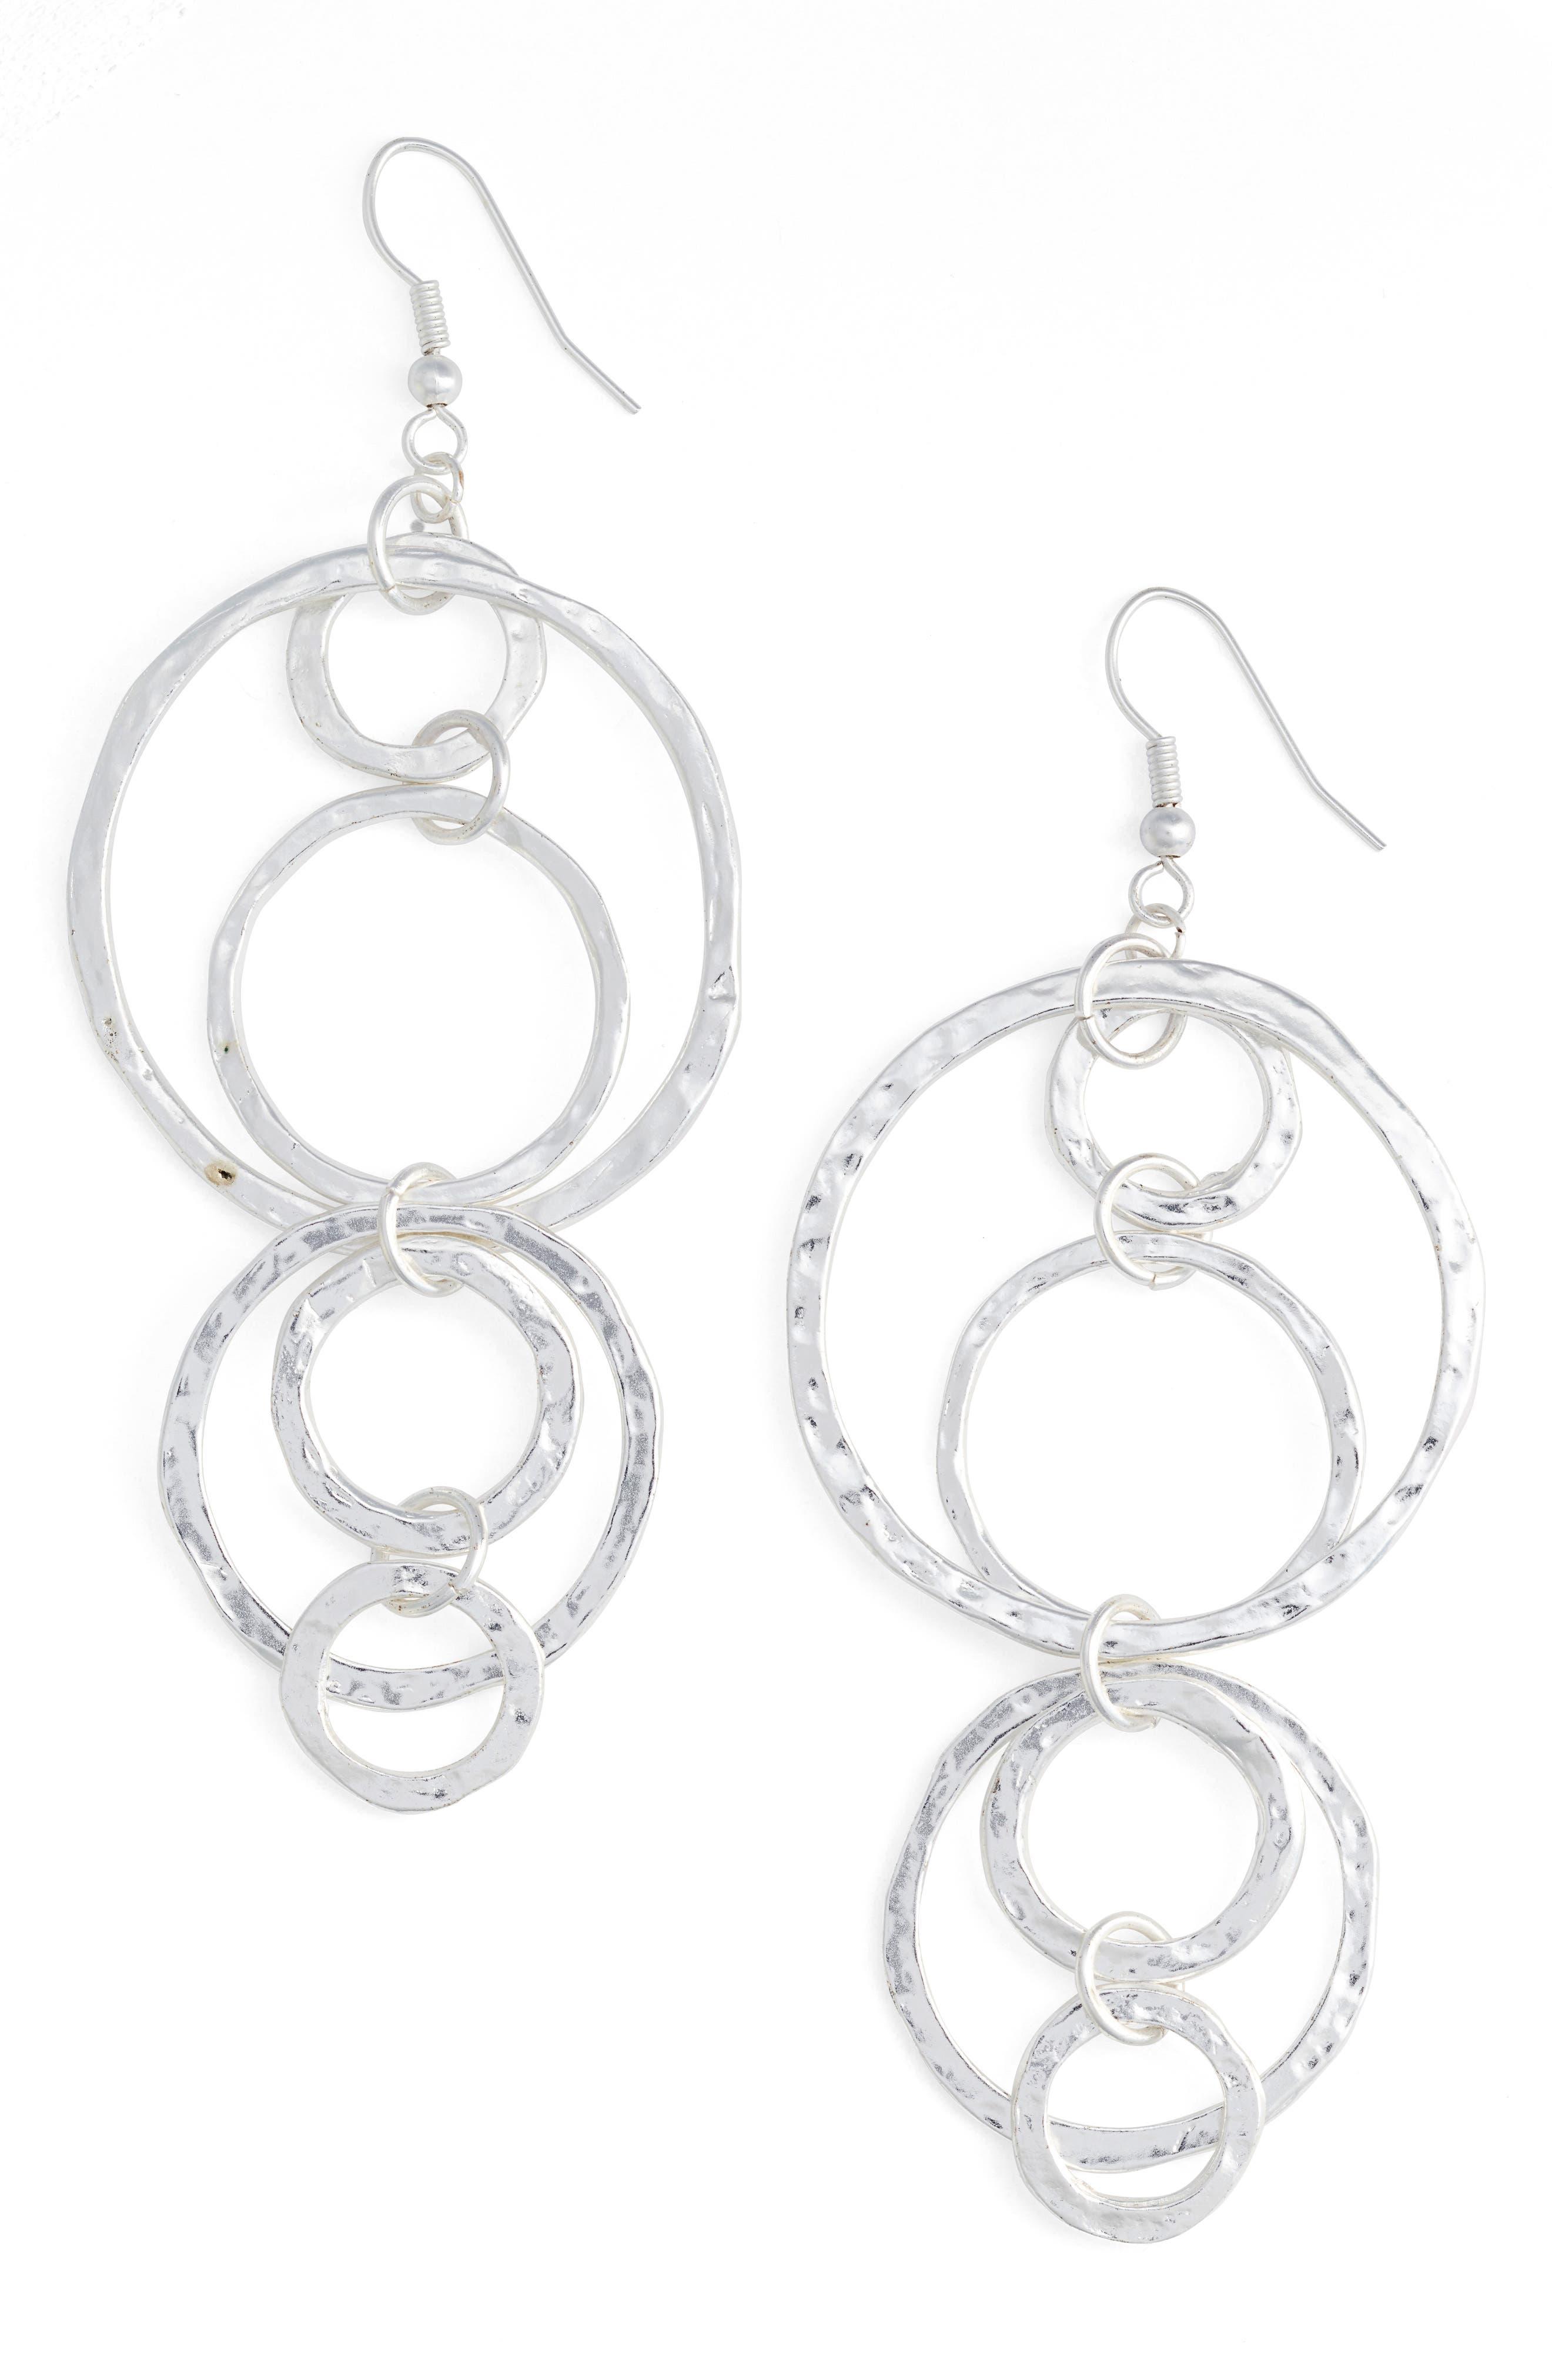 Karine Sultan Louane Multi Circle Drop Earrings